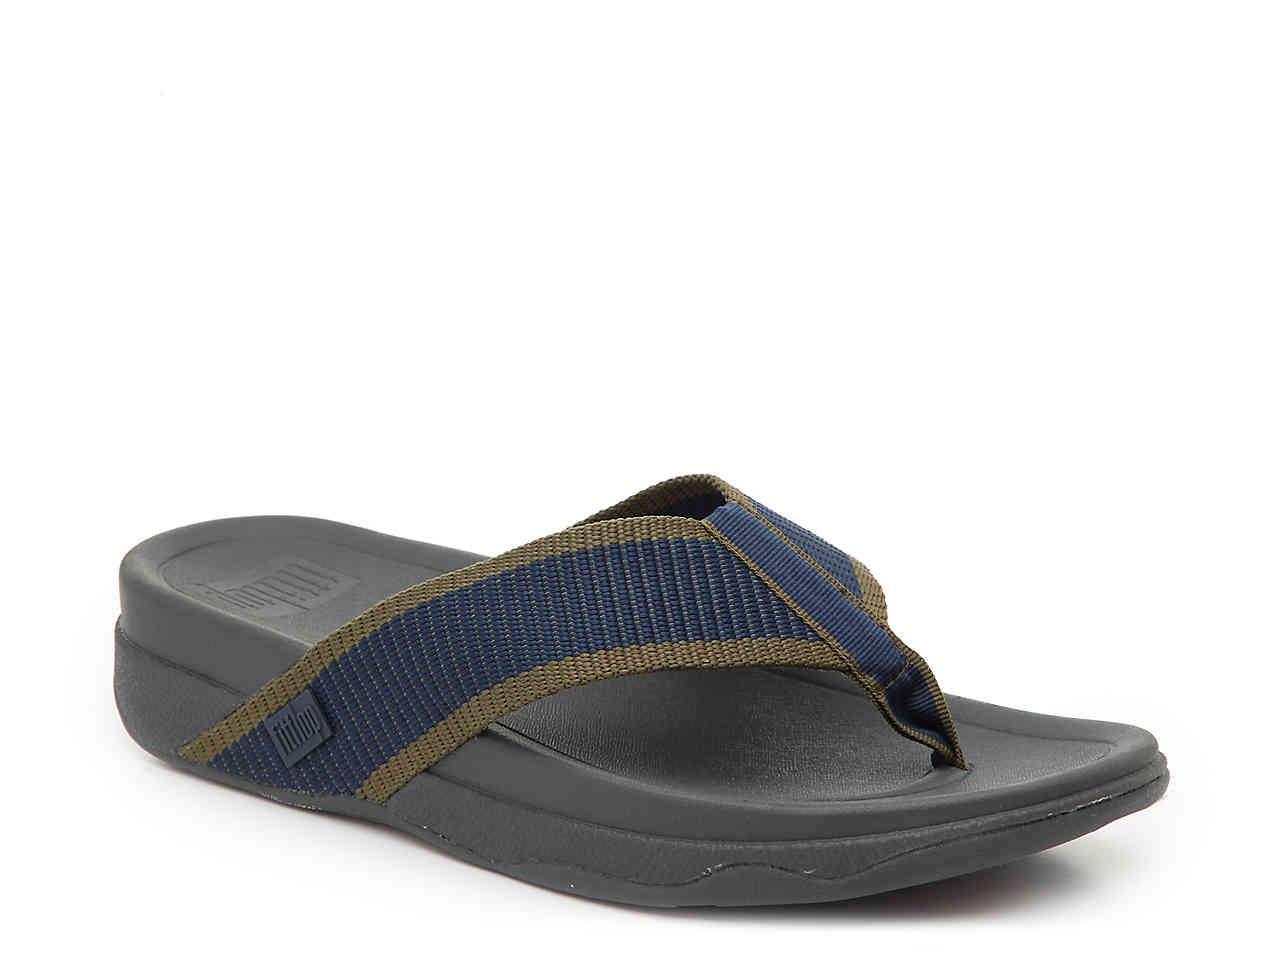 1b4a1ed362b Lyst - Fitflop Surfer Flip Flop in Blue for Men